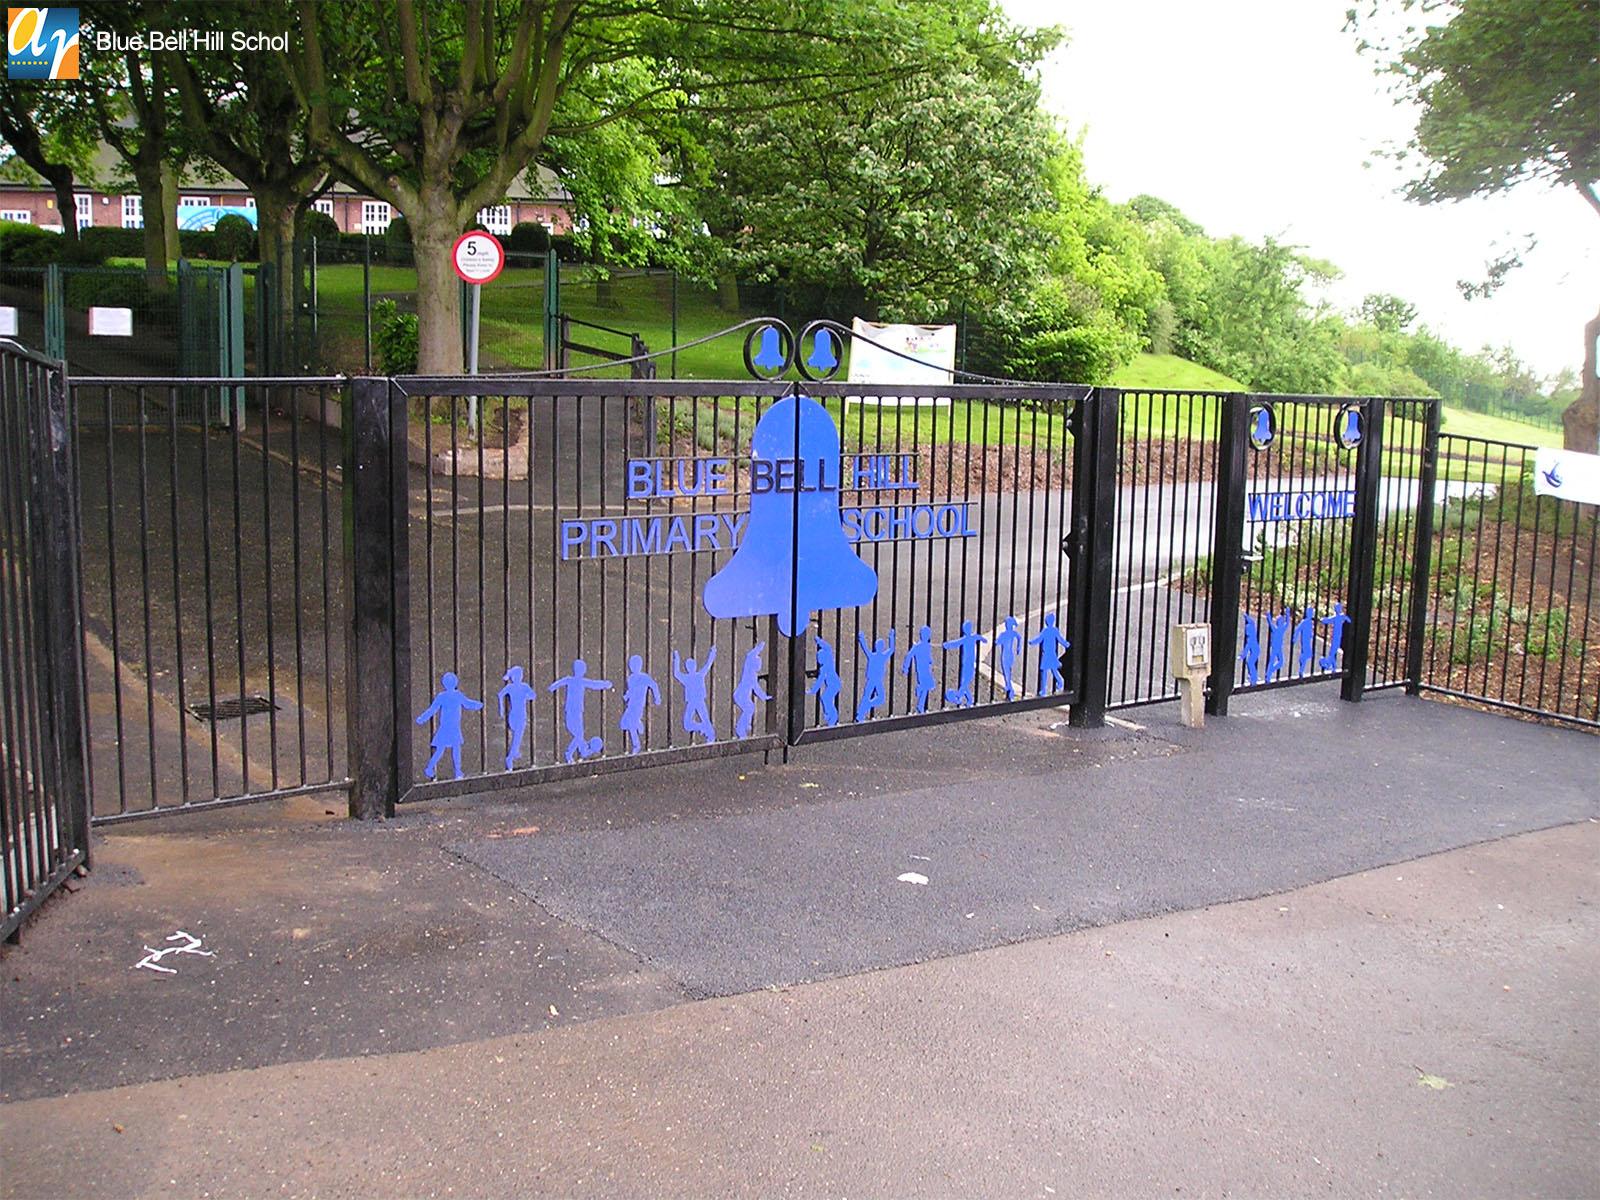 Blue Bell school metal gates